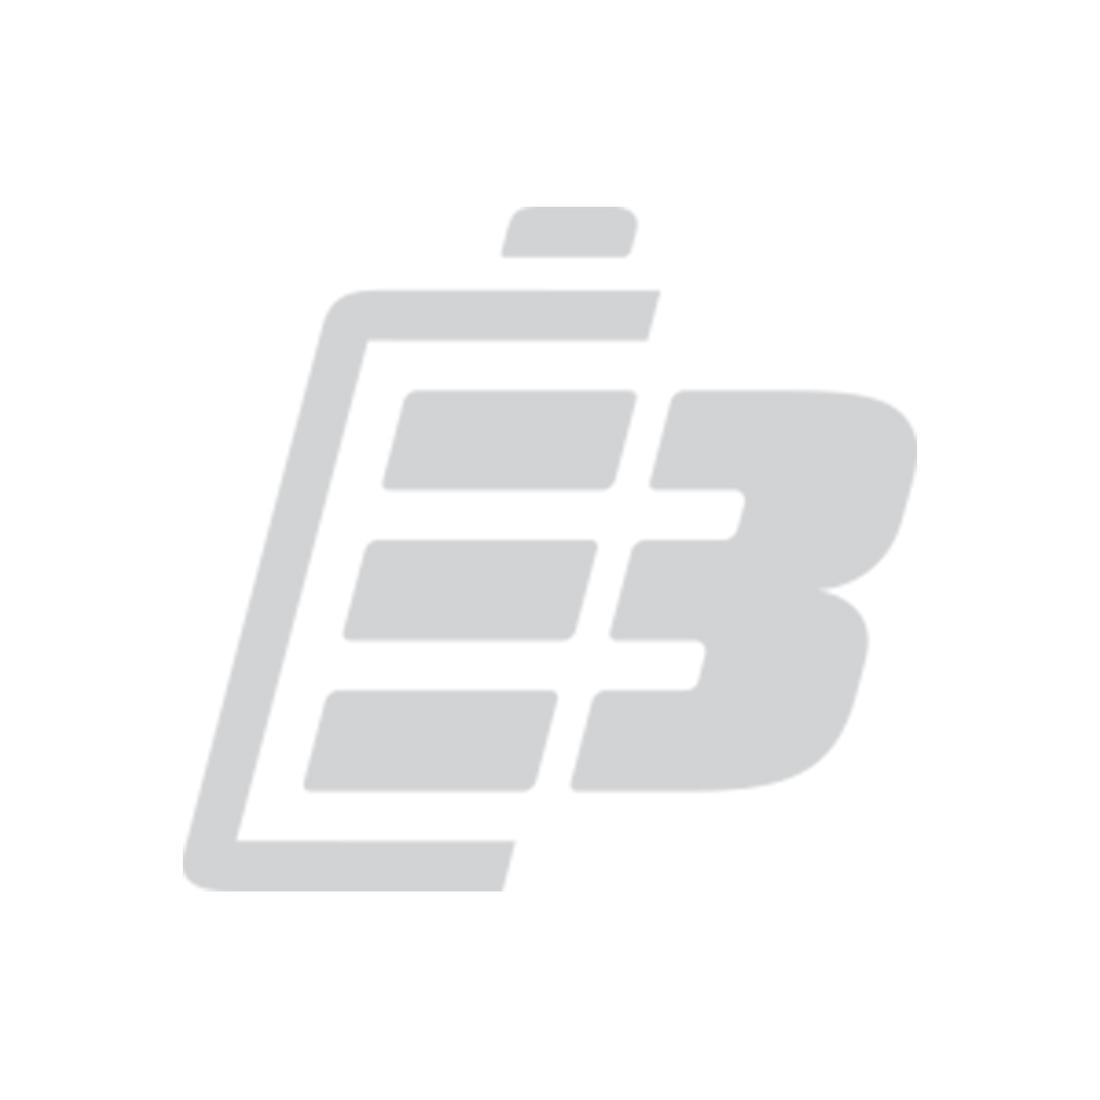 Smartphone battery Apple iPhone 4G_1